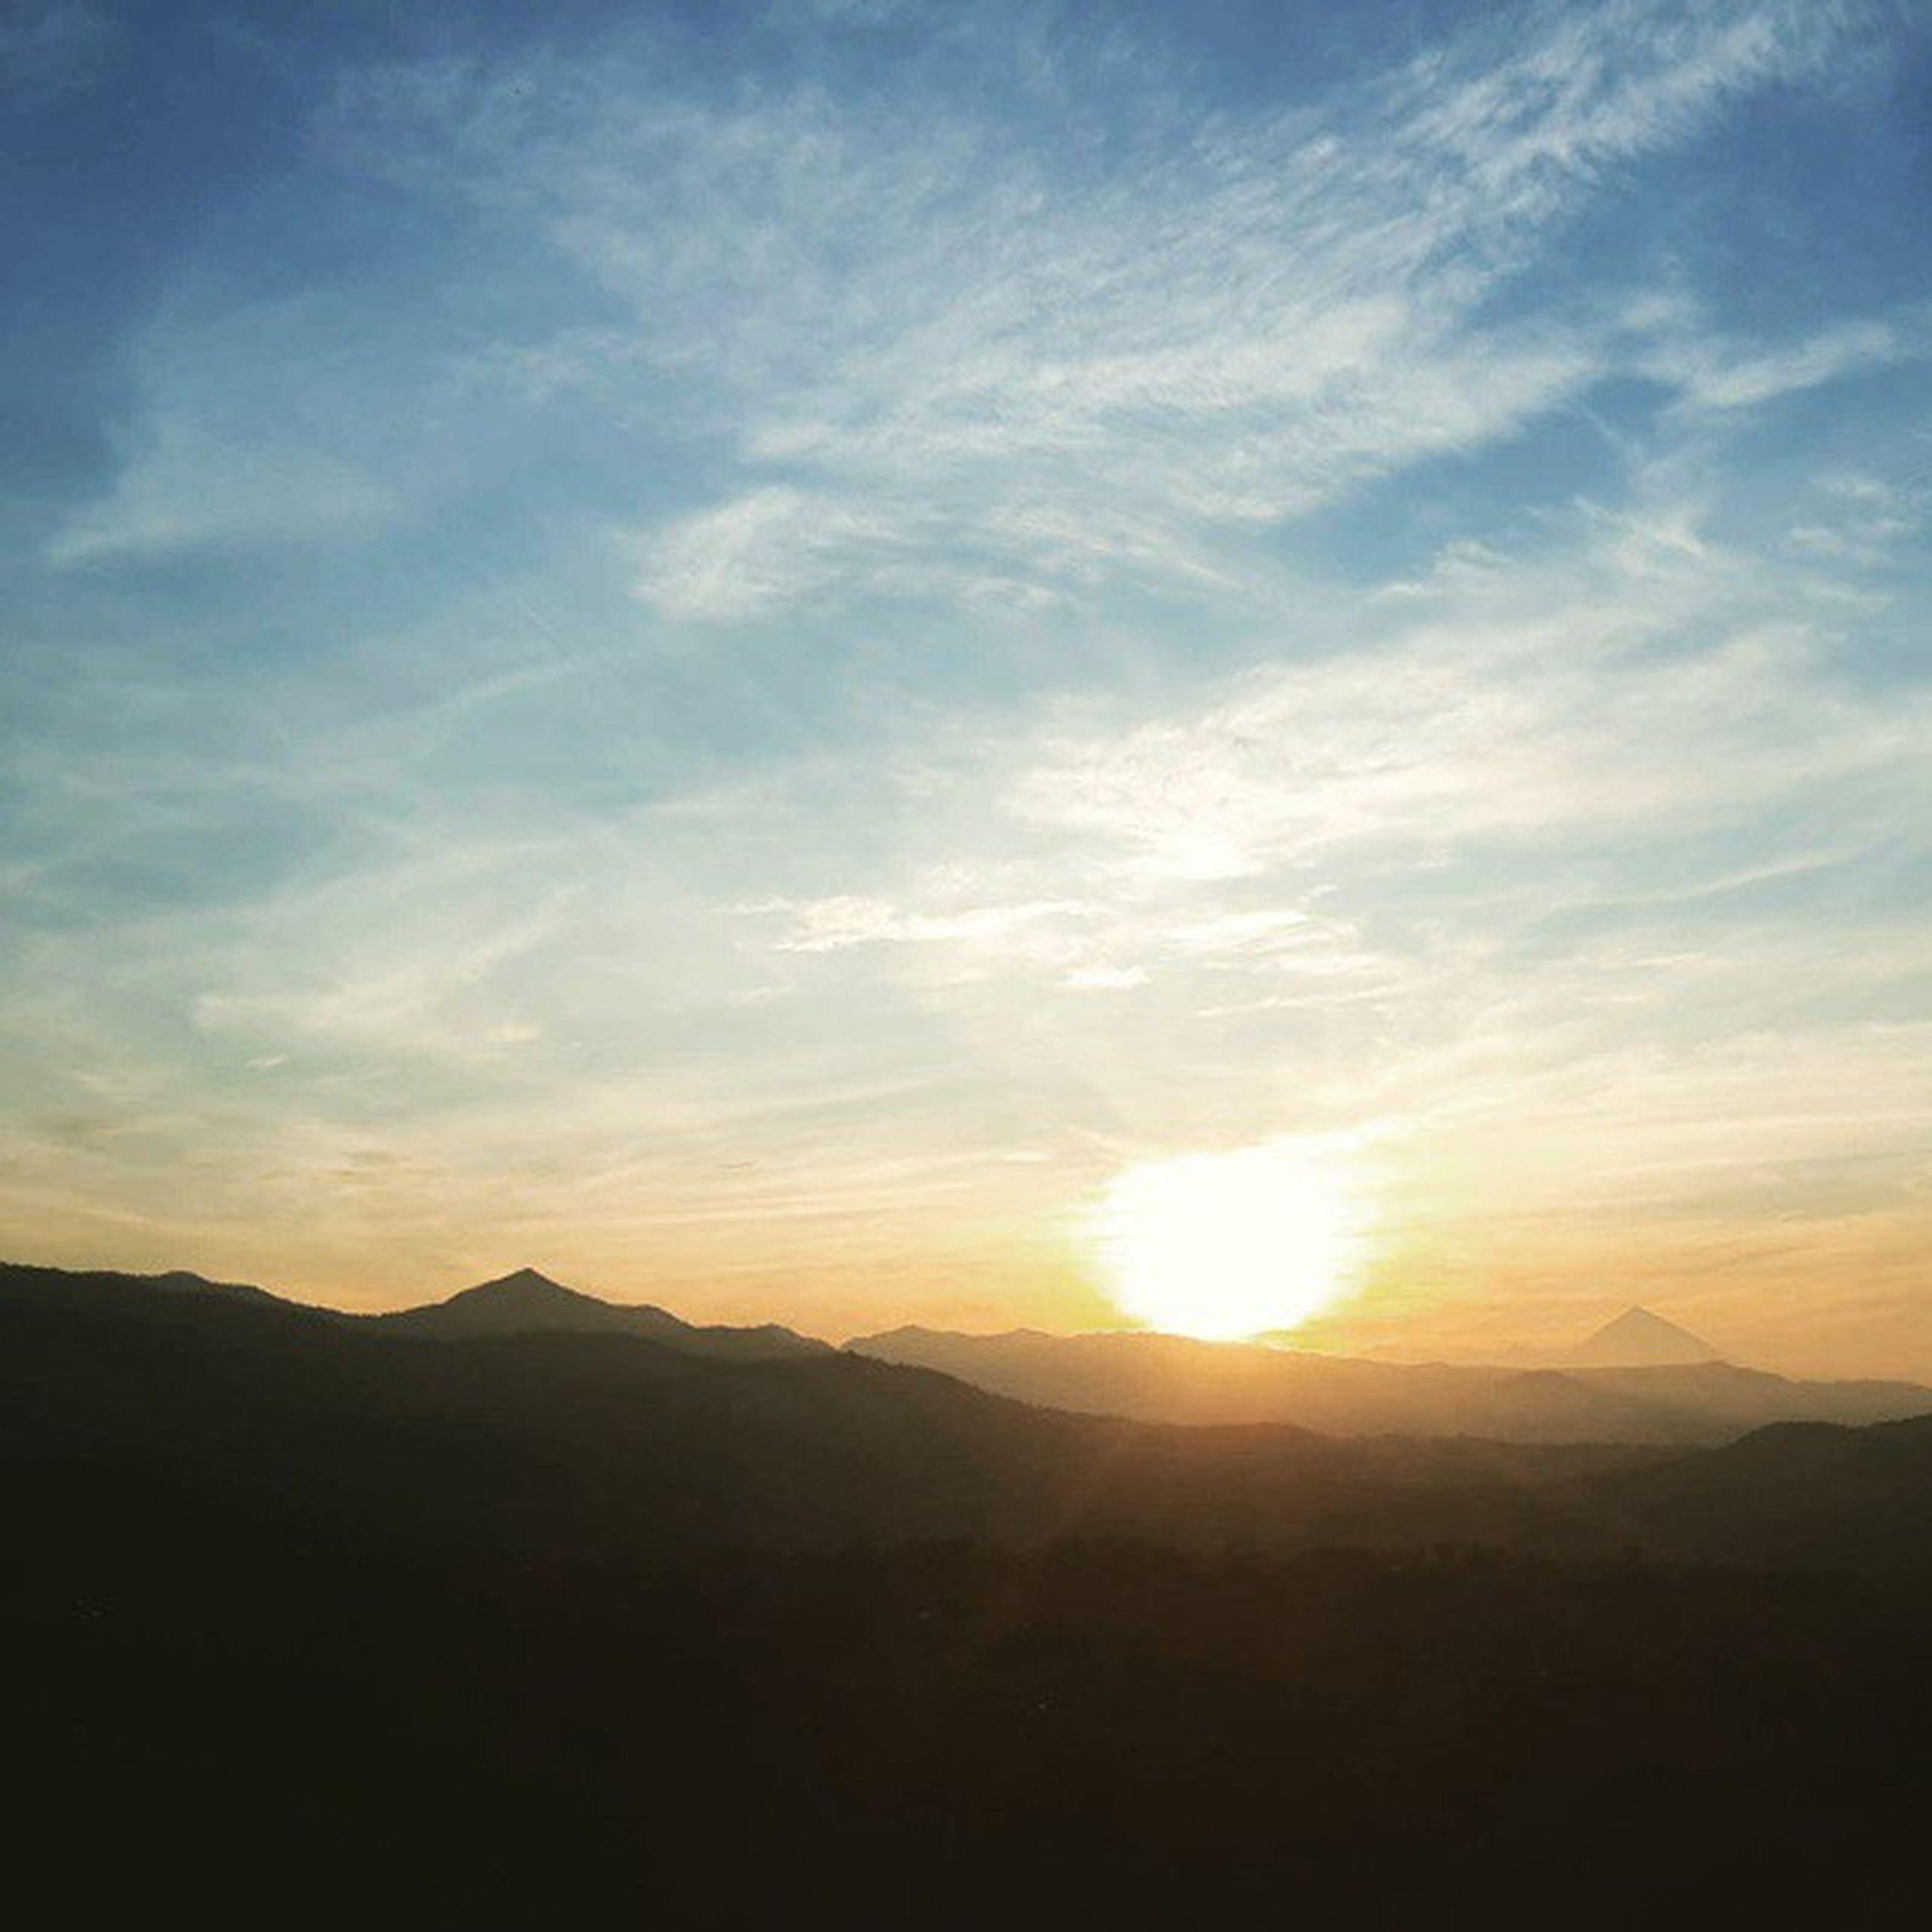 sunset, tranquil scene, scenics, tranquility, beauty in nature, silhouette, sun, mountain, sky, landscape, nature, idyllic, mountain range, sunlight, sunbeam, cloud - sky, cloud, non-urban scene, majestic, outdoors